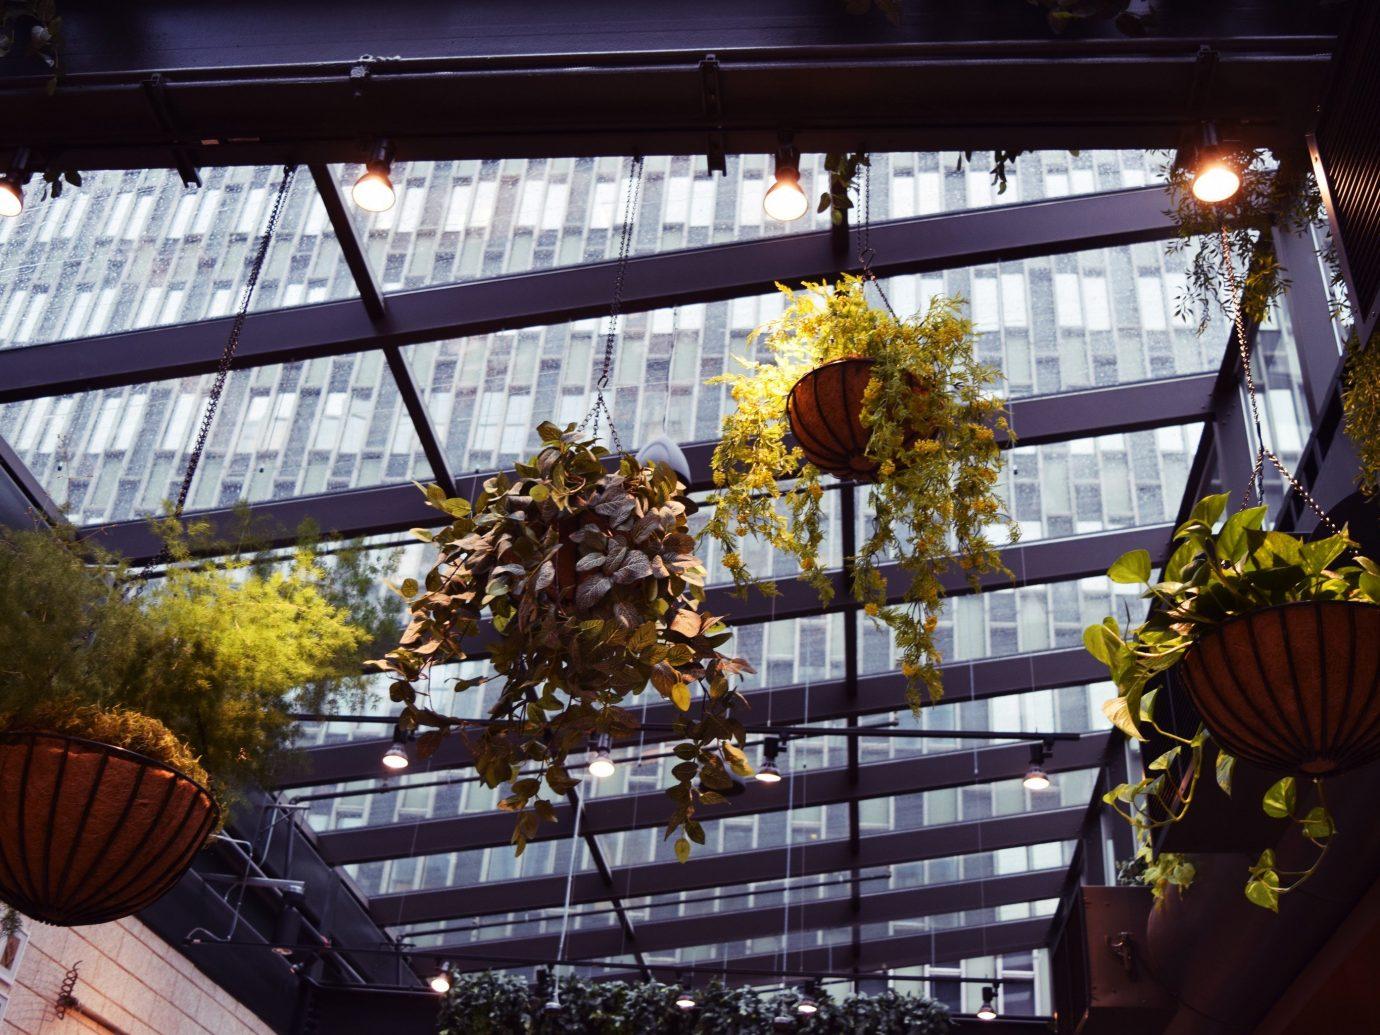 Plants hanging from the season in Terra in Boston